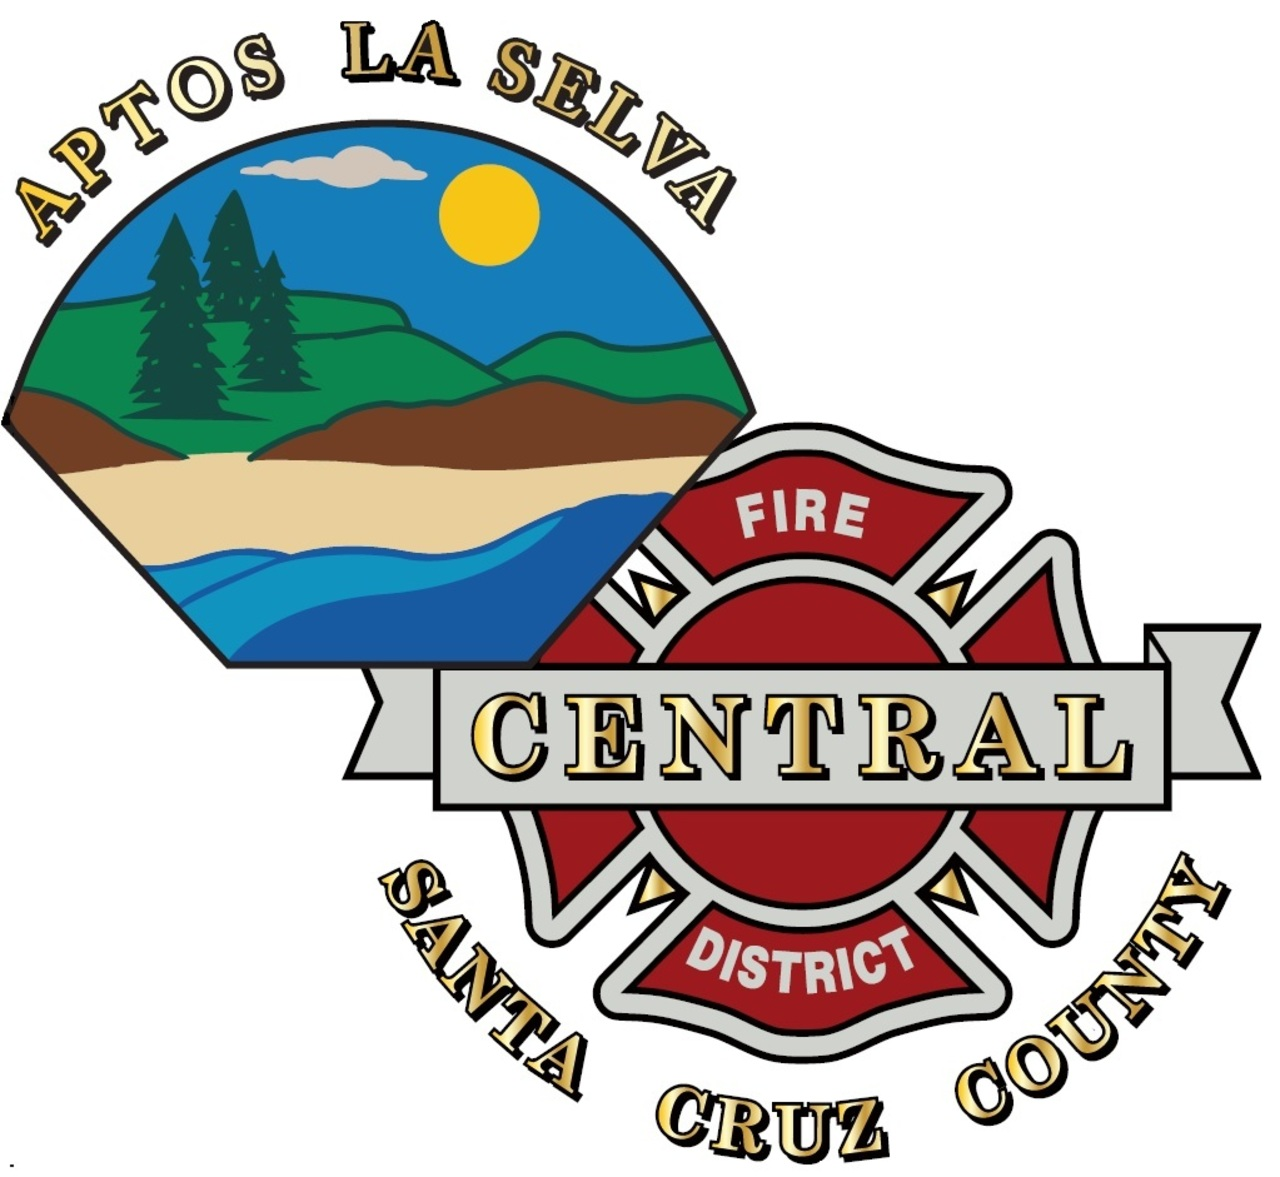 Central & Aptos/La Selva Fire Districts